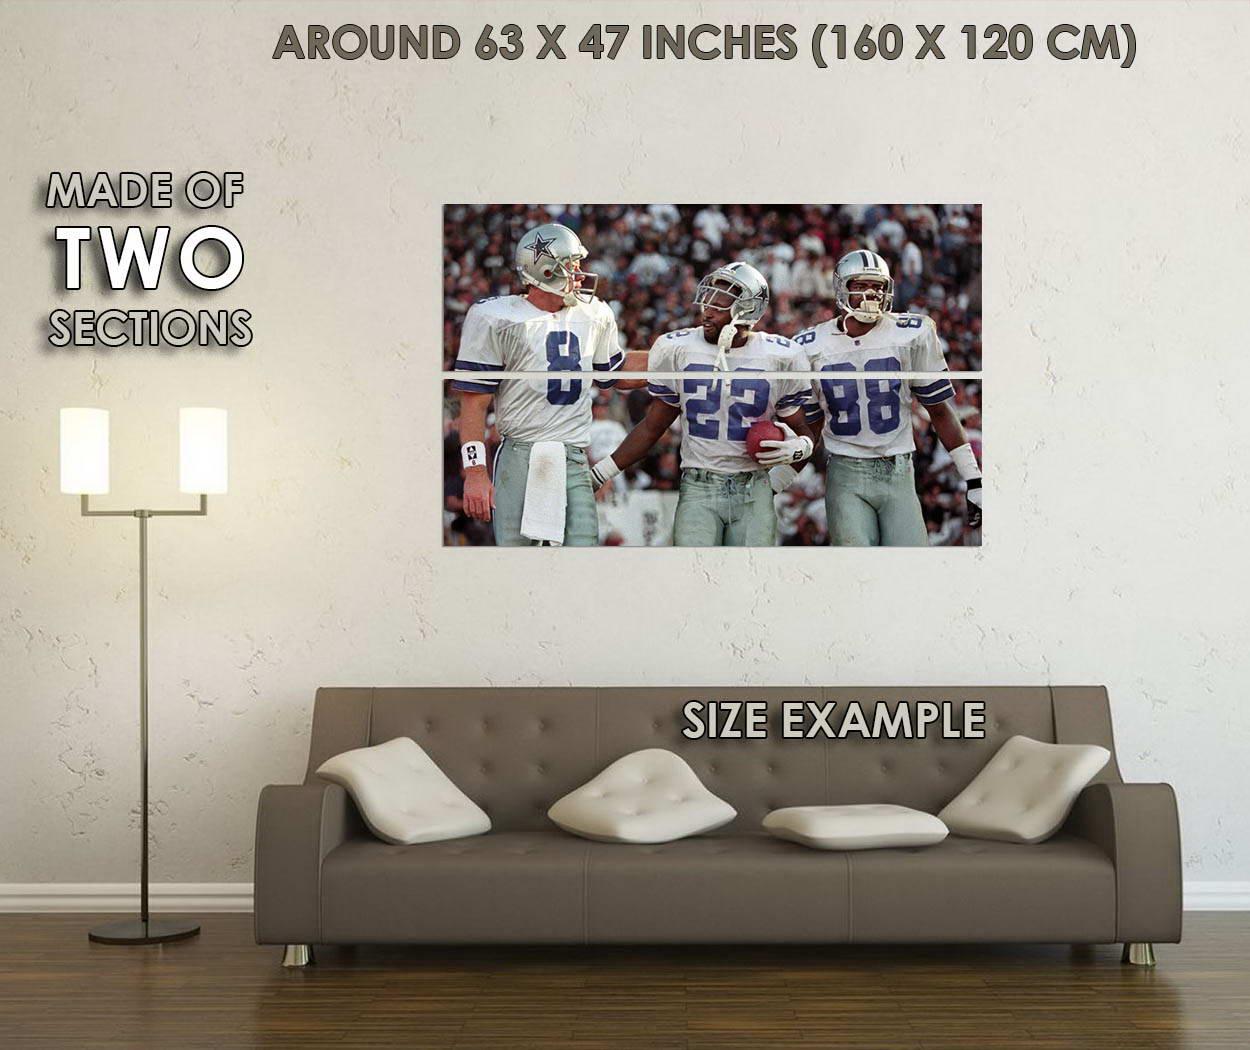 10787-Emmitt-Smith-NFL-Soccer-Sports-LAMINATED-POSTER-CA thumbnail 6